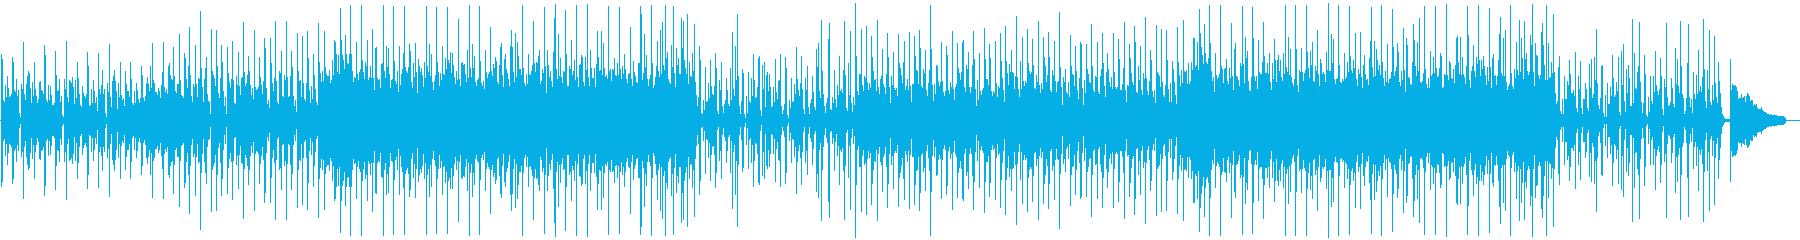 CM用8A、楽しい口笛&ウクレレ・ロックの再生済みの波形